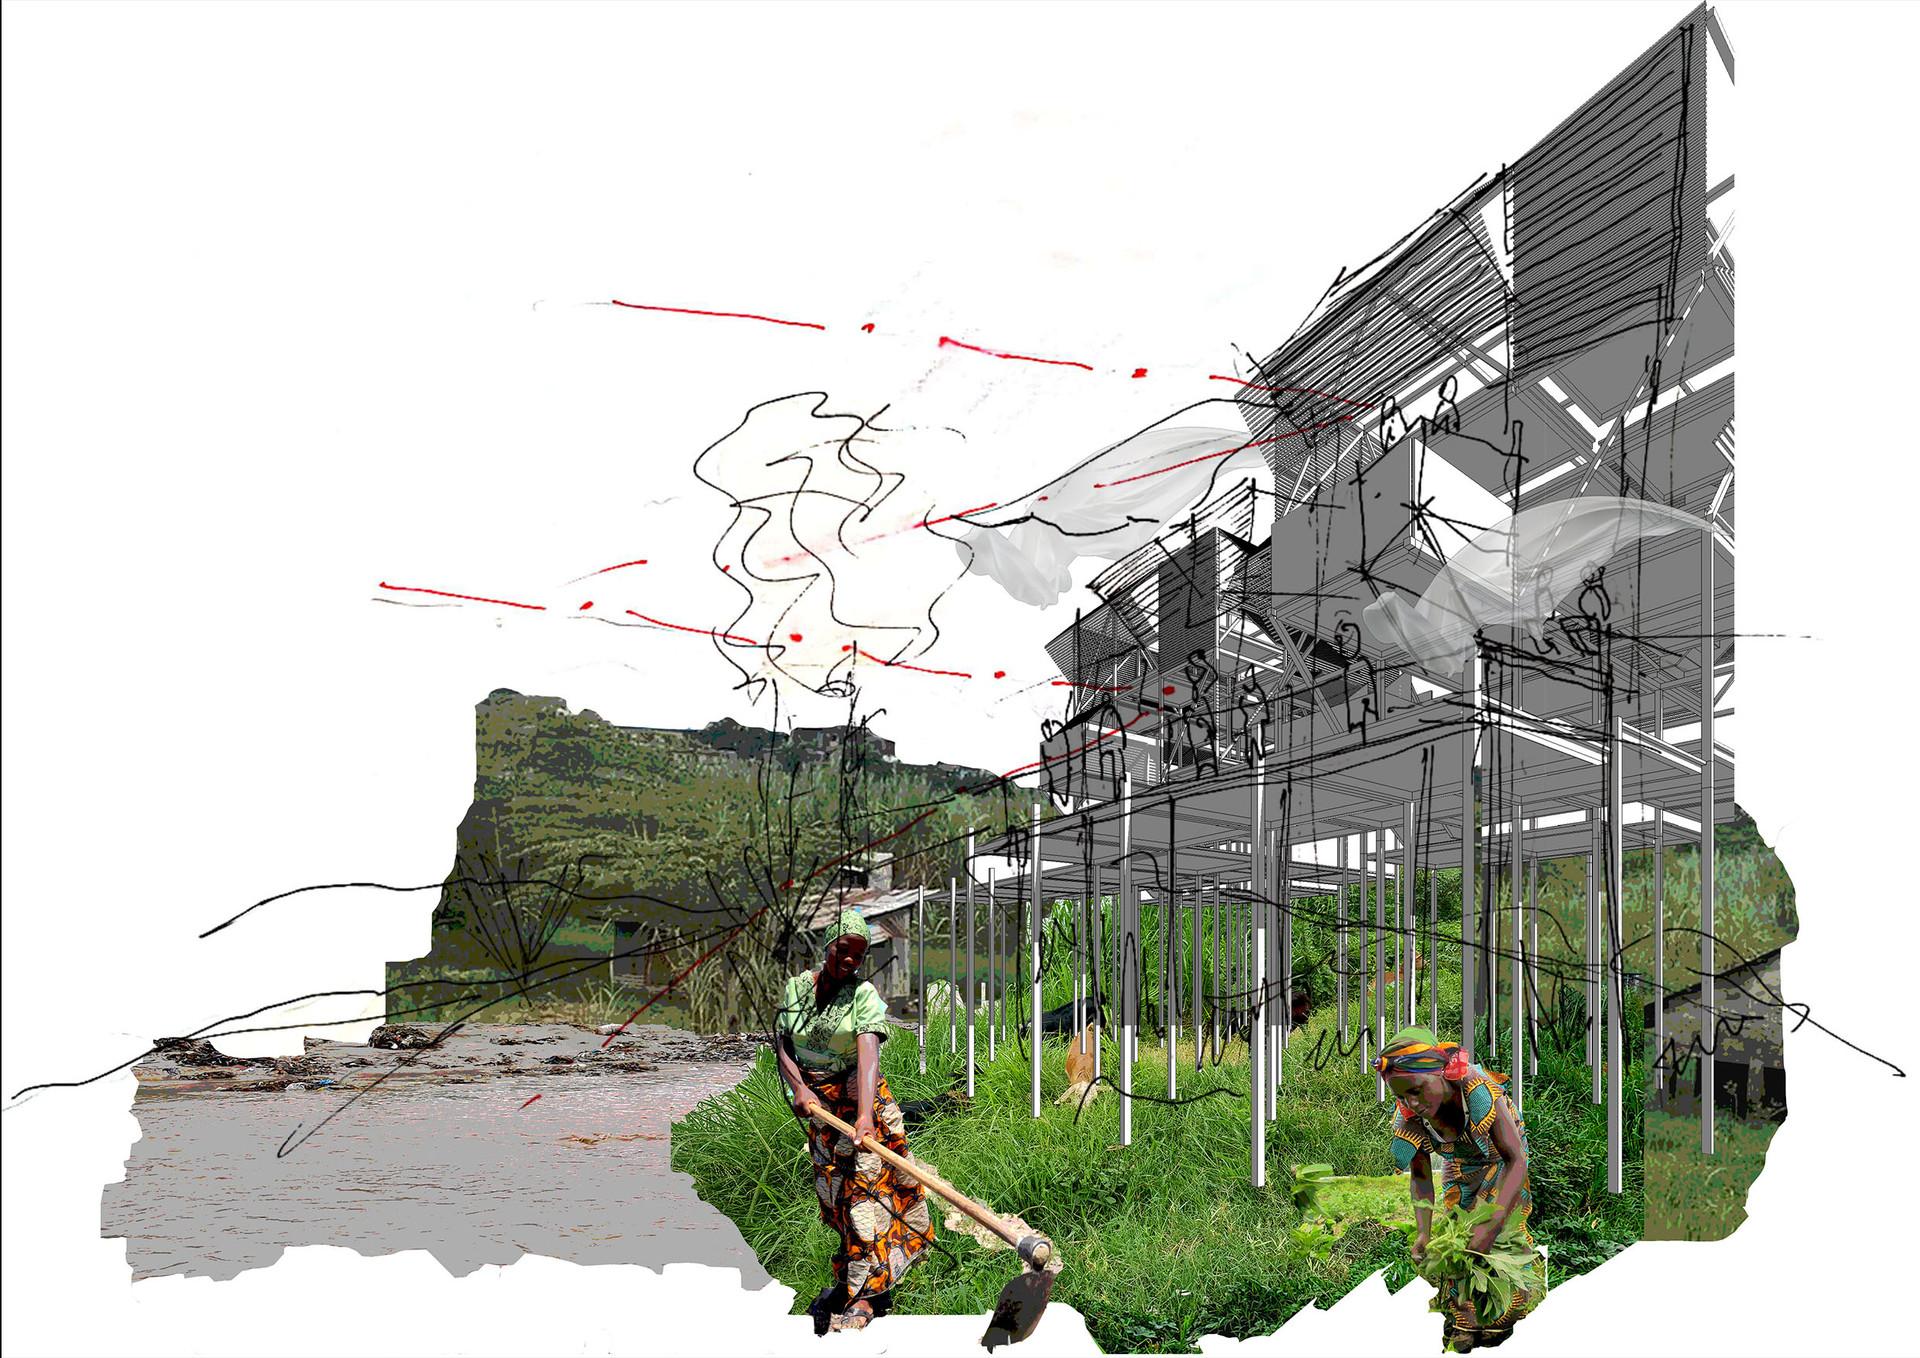 Wetland Sketch Proposal. Shube, N. Unit 15X. 2020.